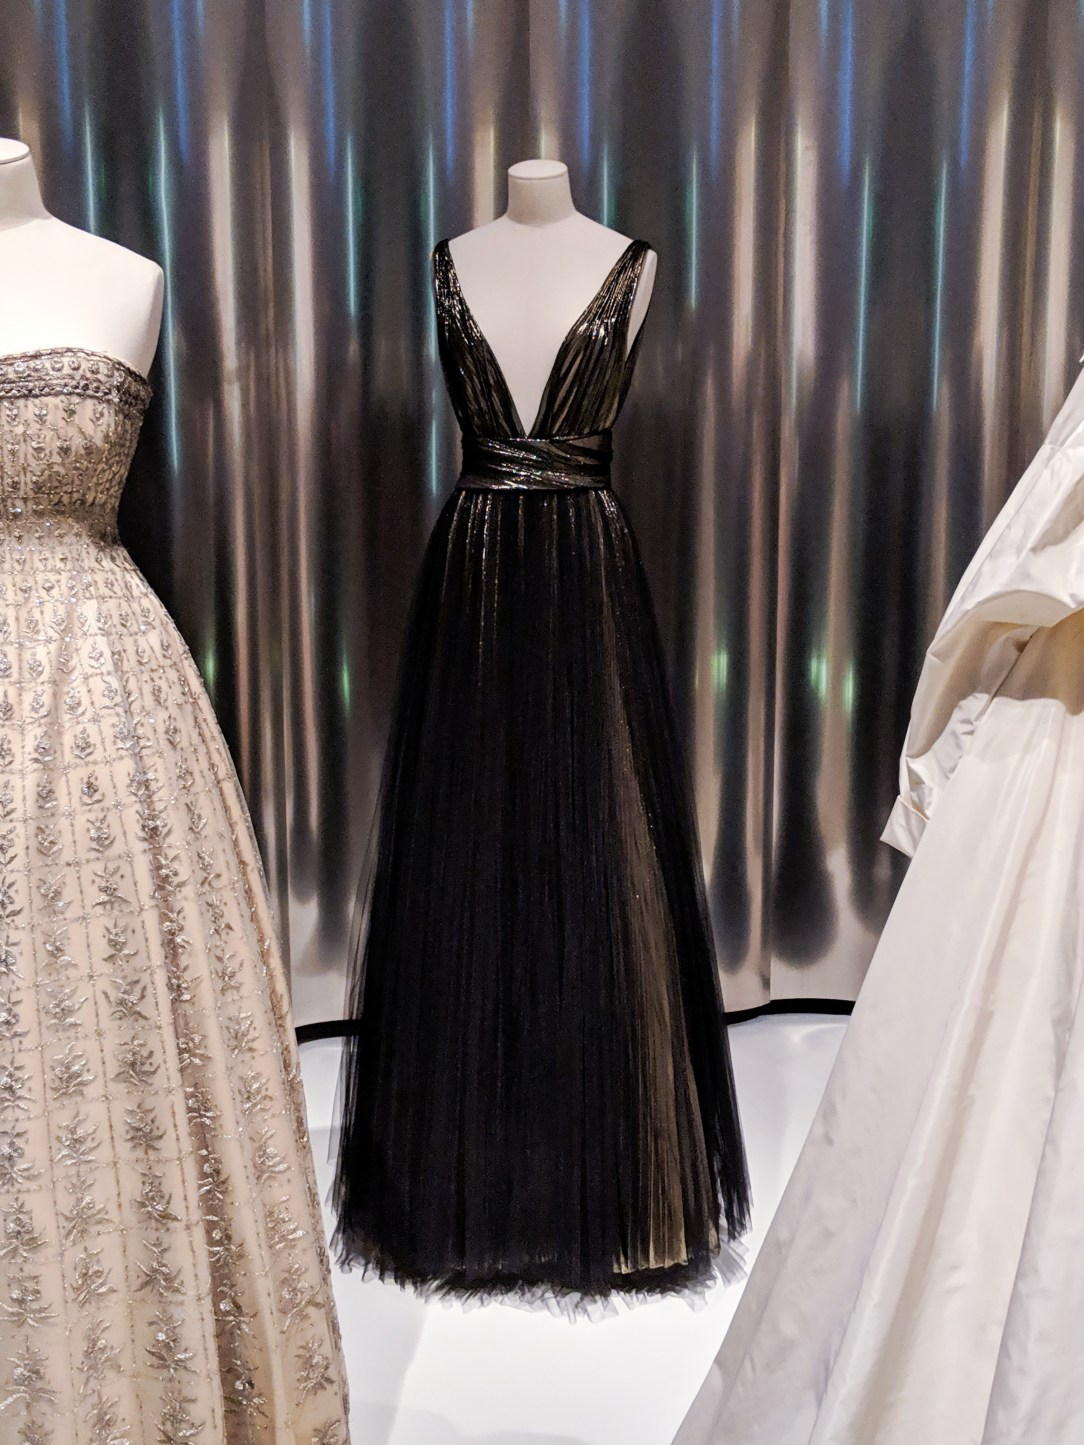 dark gold Dior gown worn by Charlize Theron